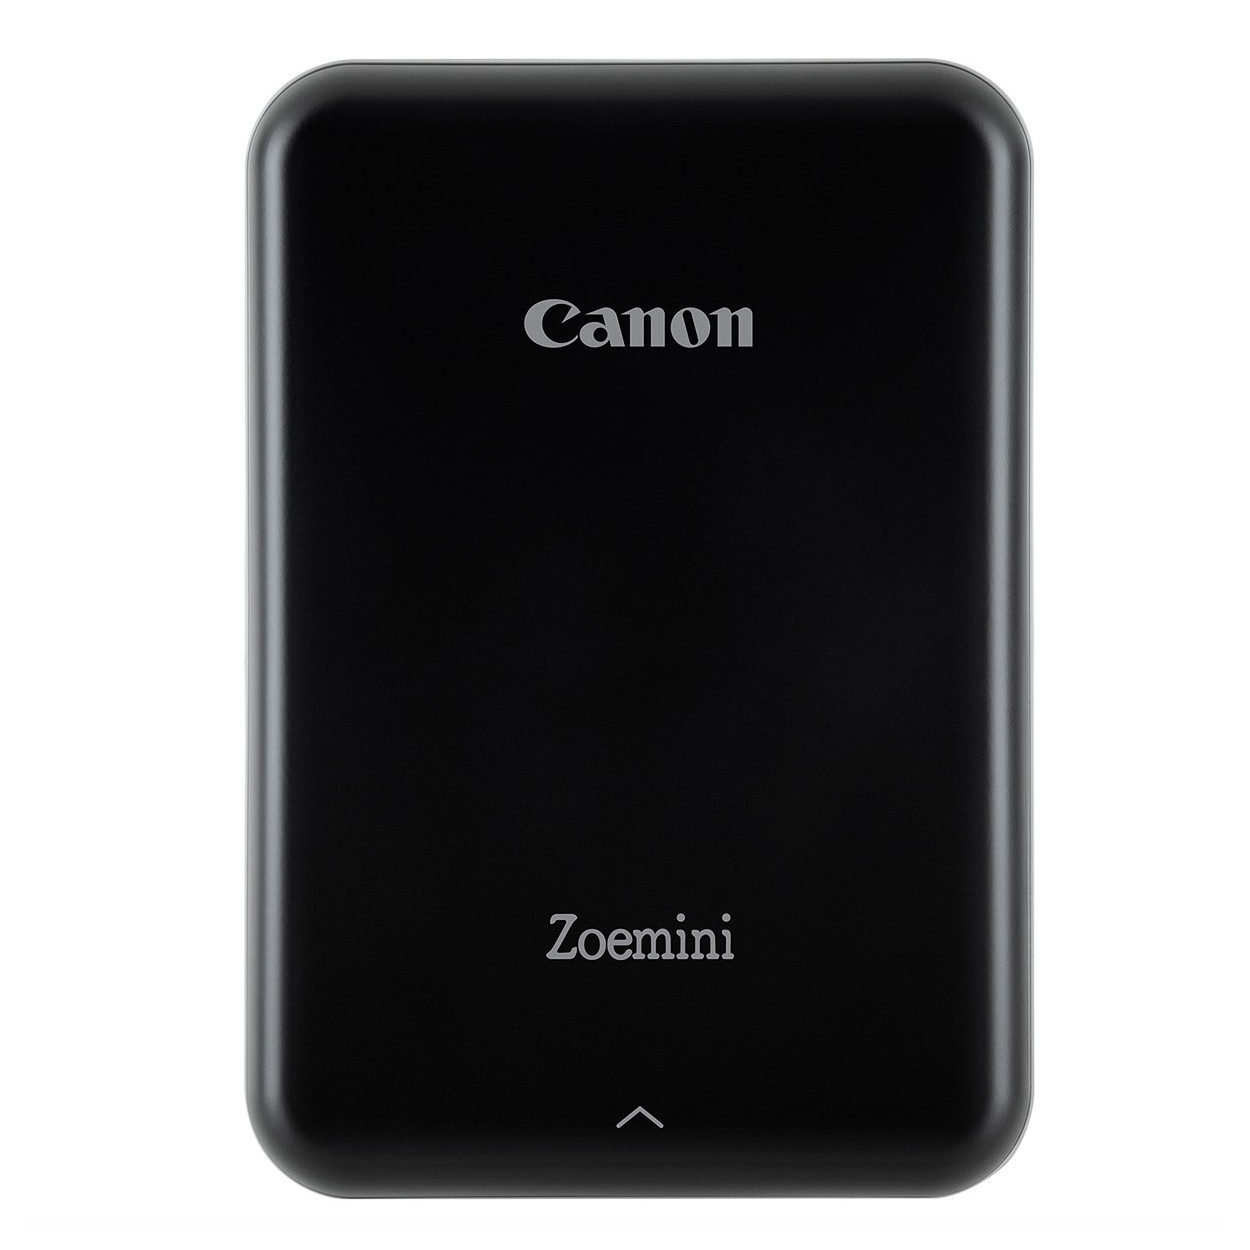 Canon Zoemini draagbare fotoprinter Zwart